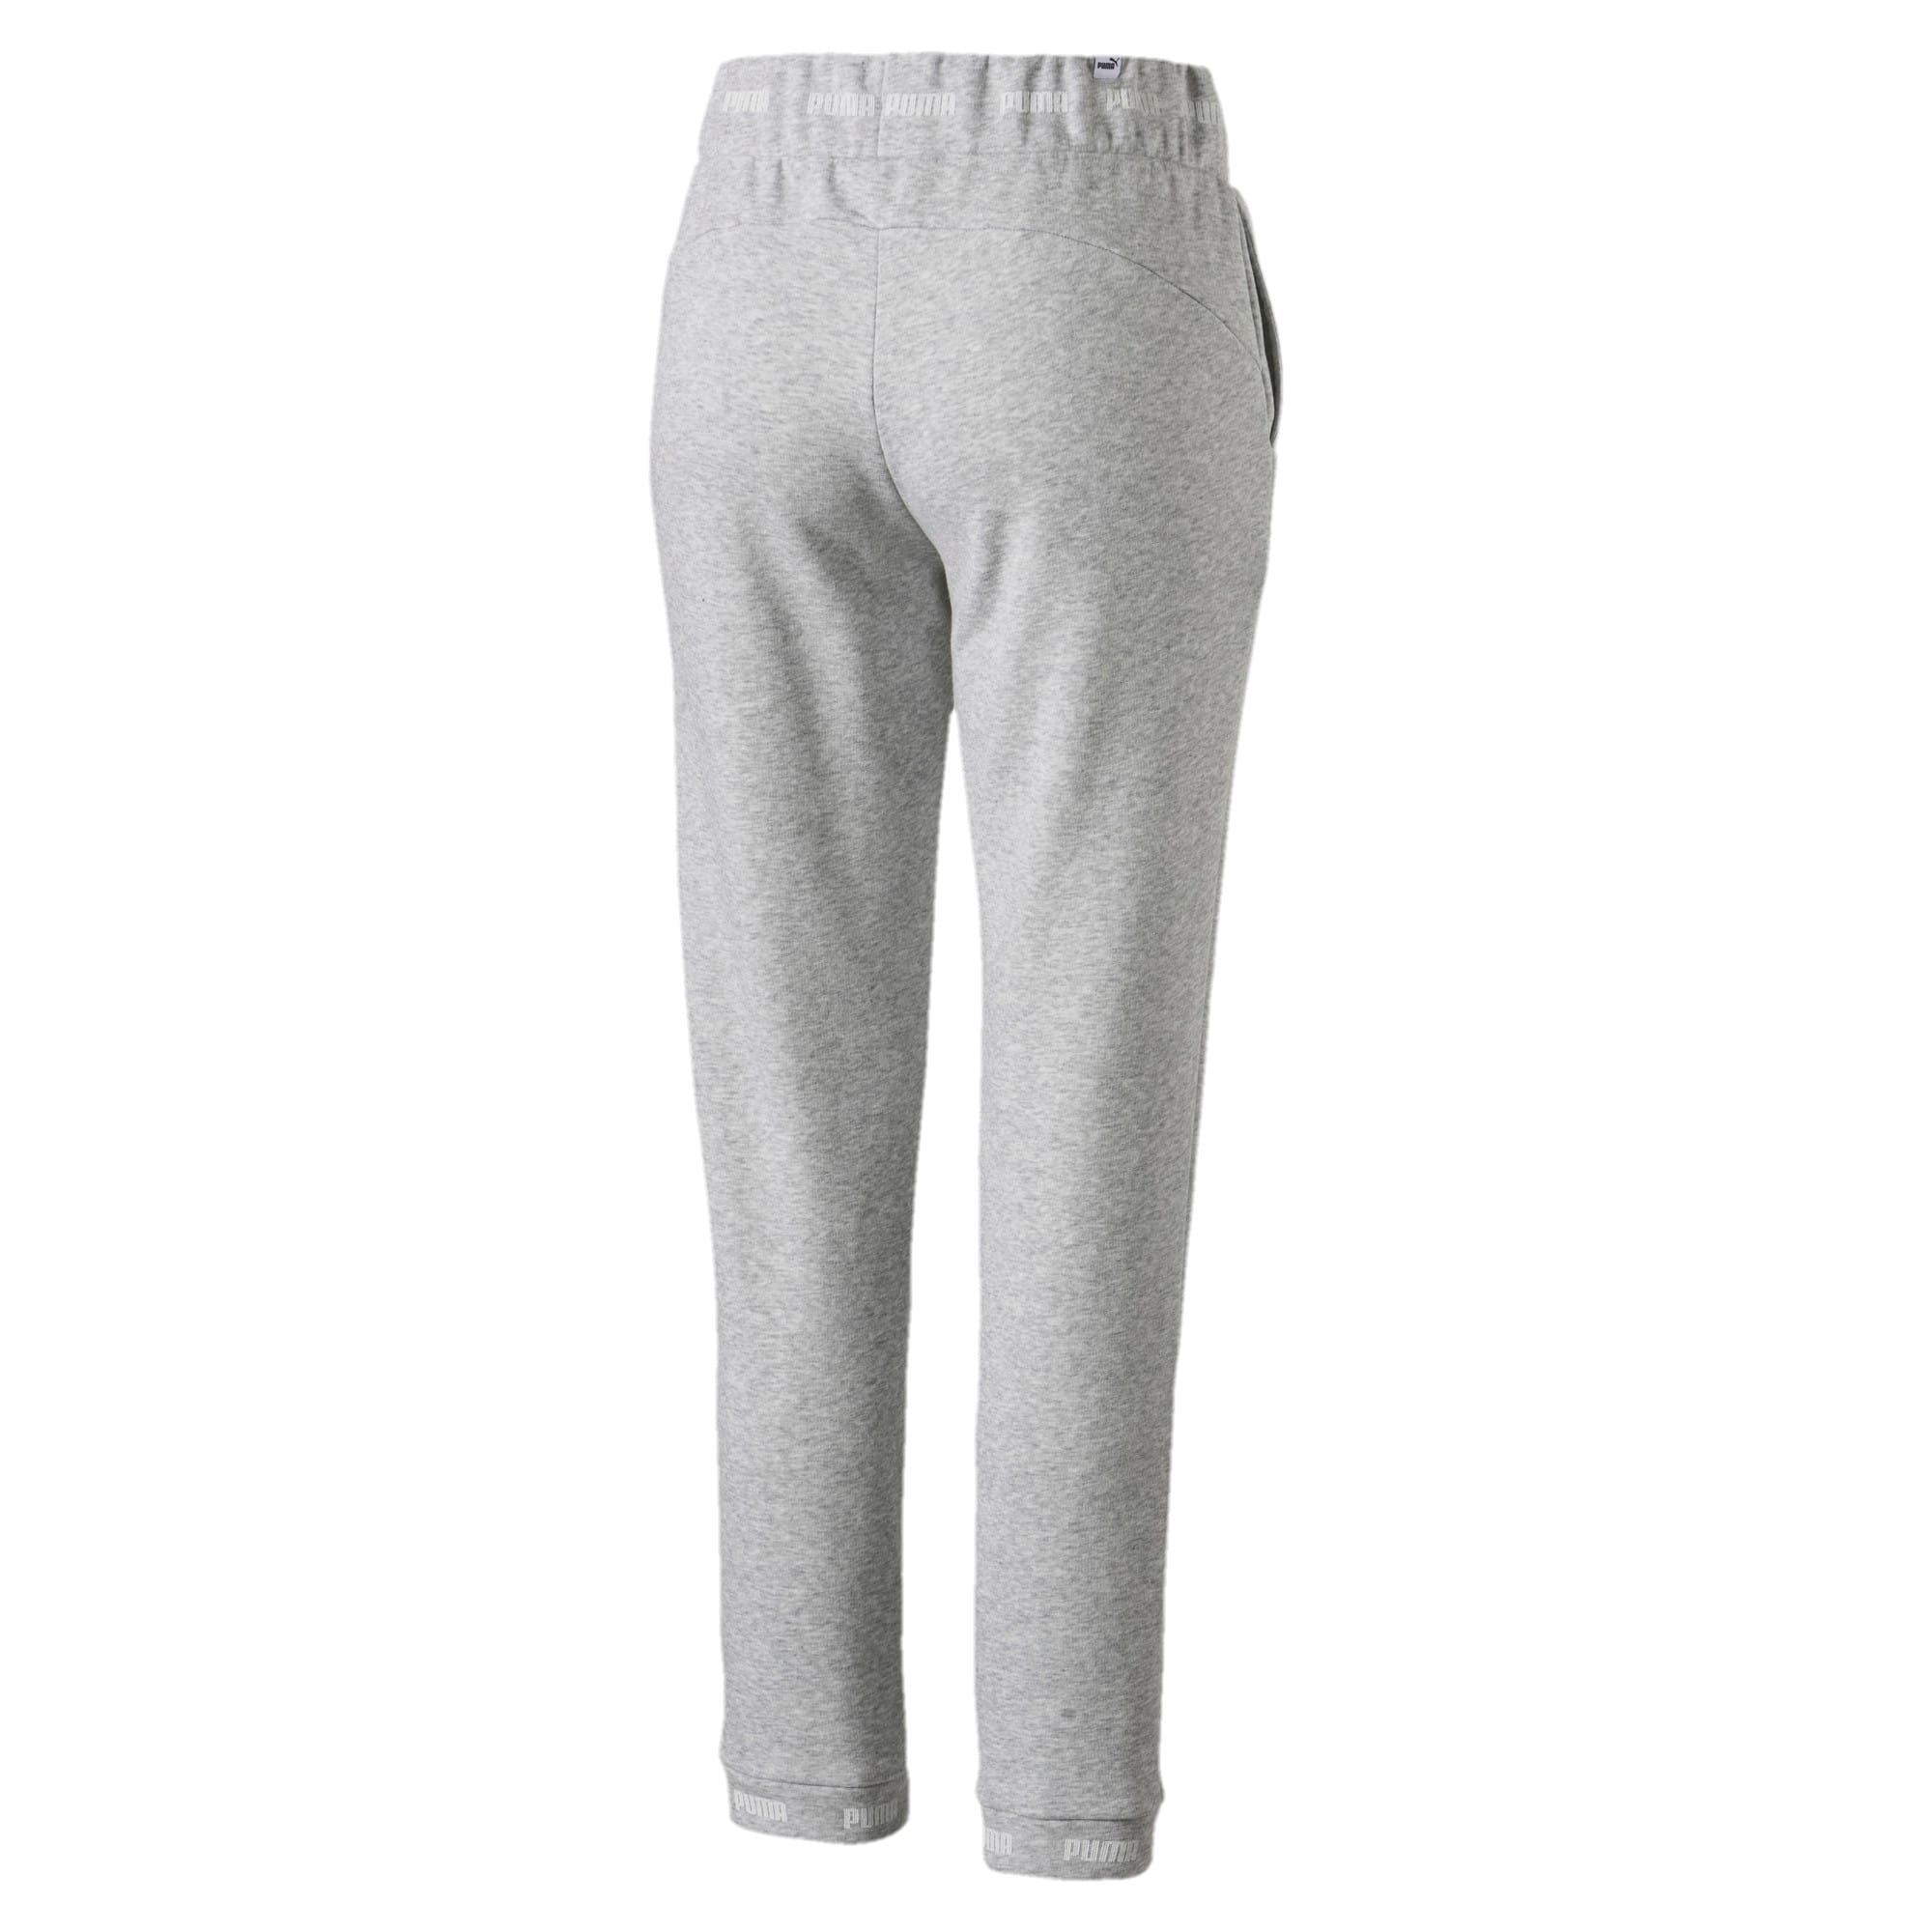 Thumbnail 2 of Amplified Women's Sweatpants, Light Gray Heather, medium